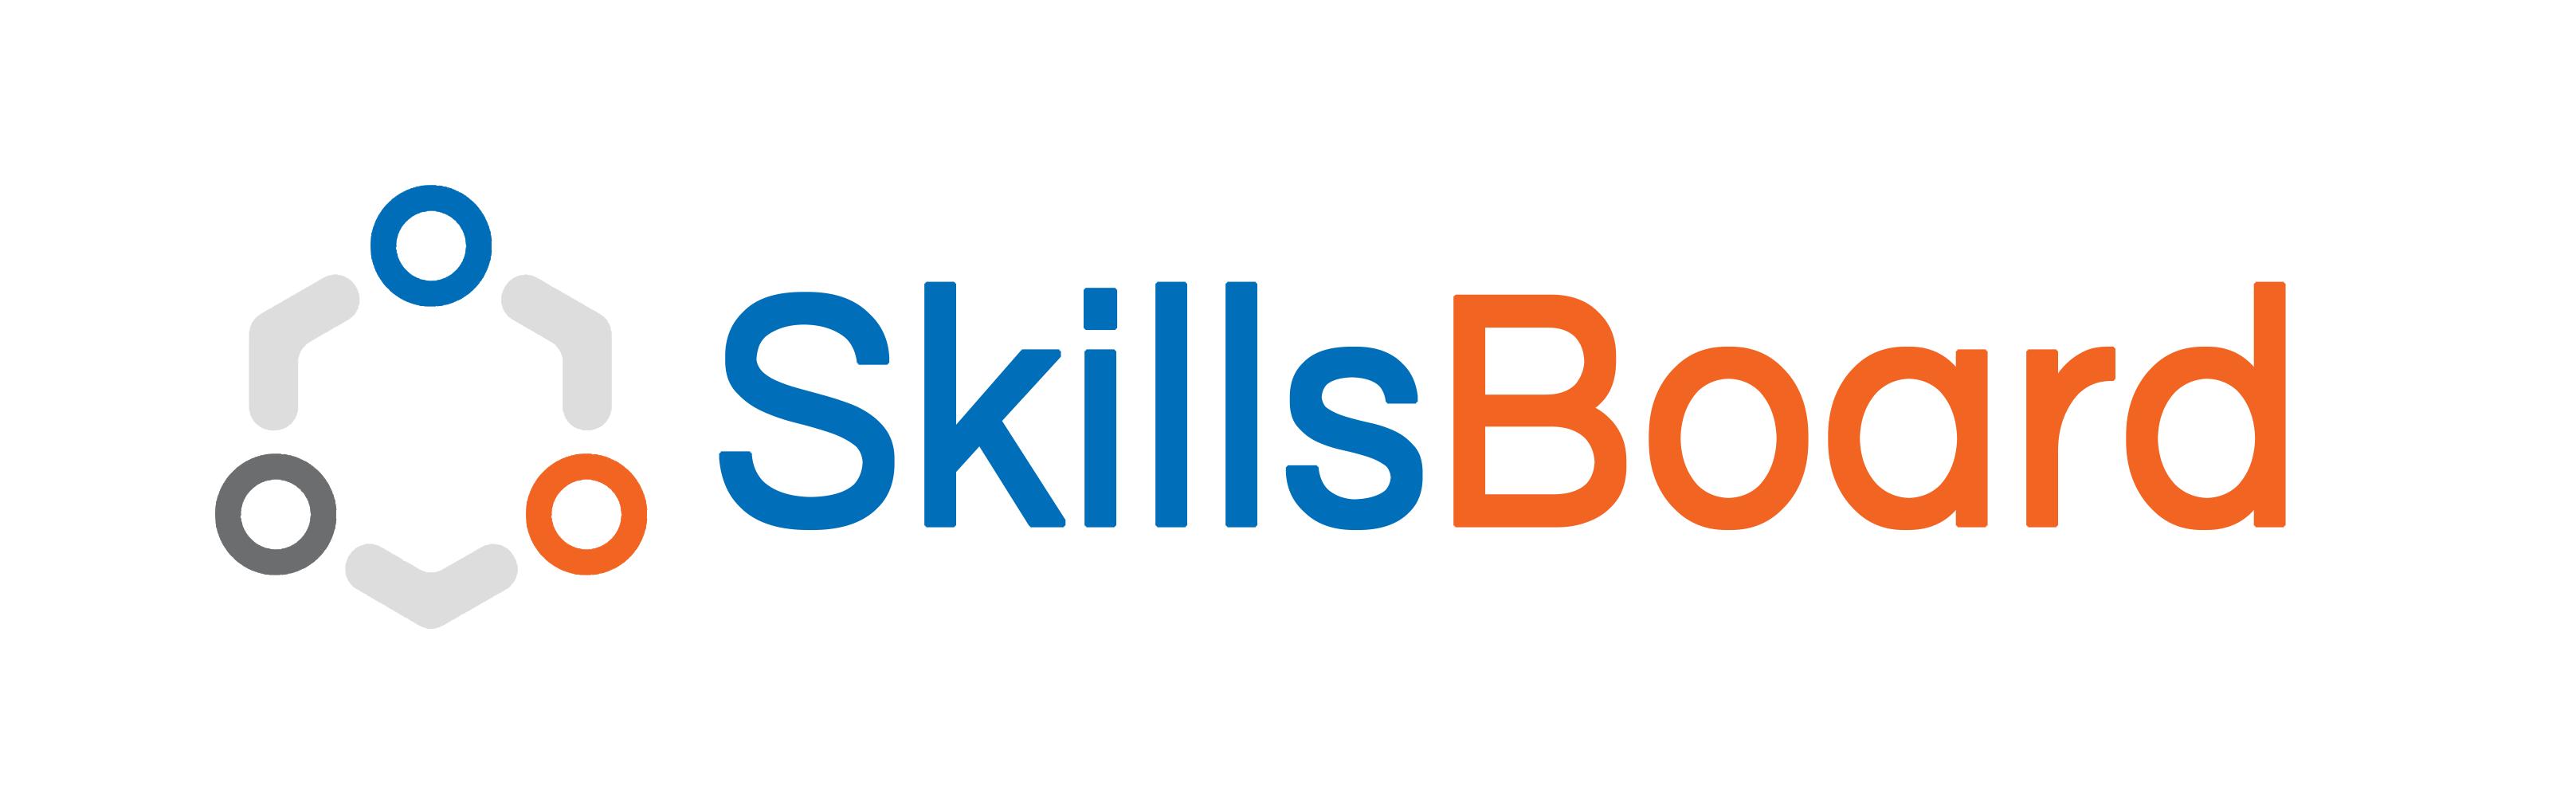 Skillsboard News